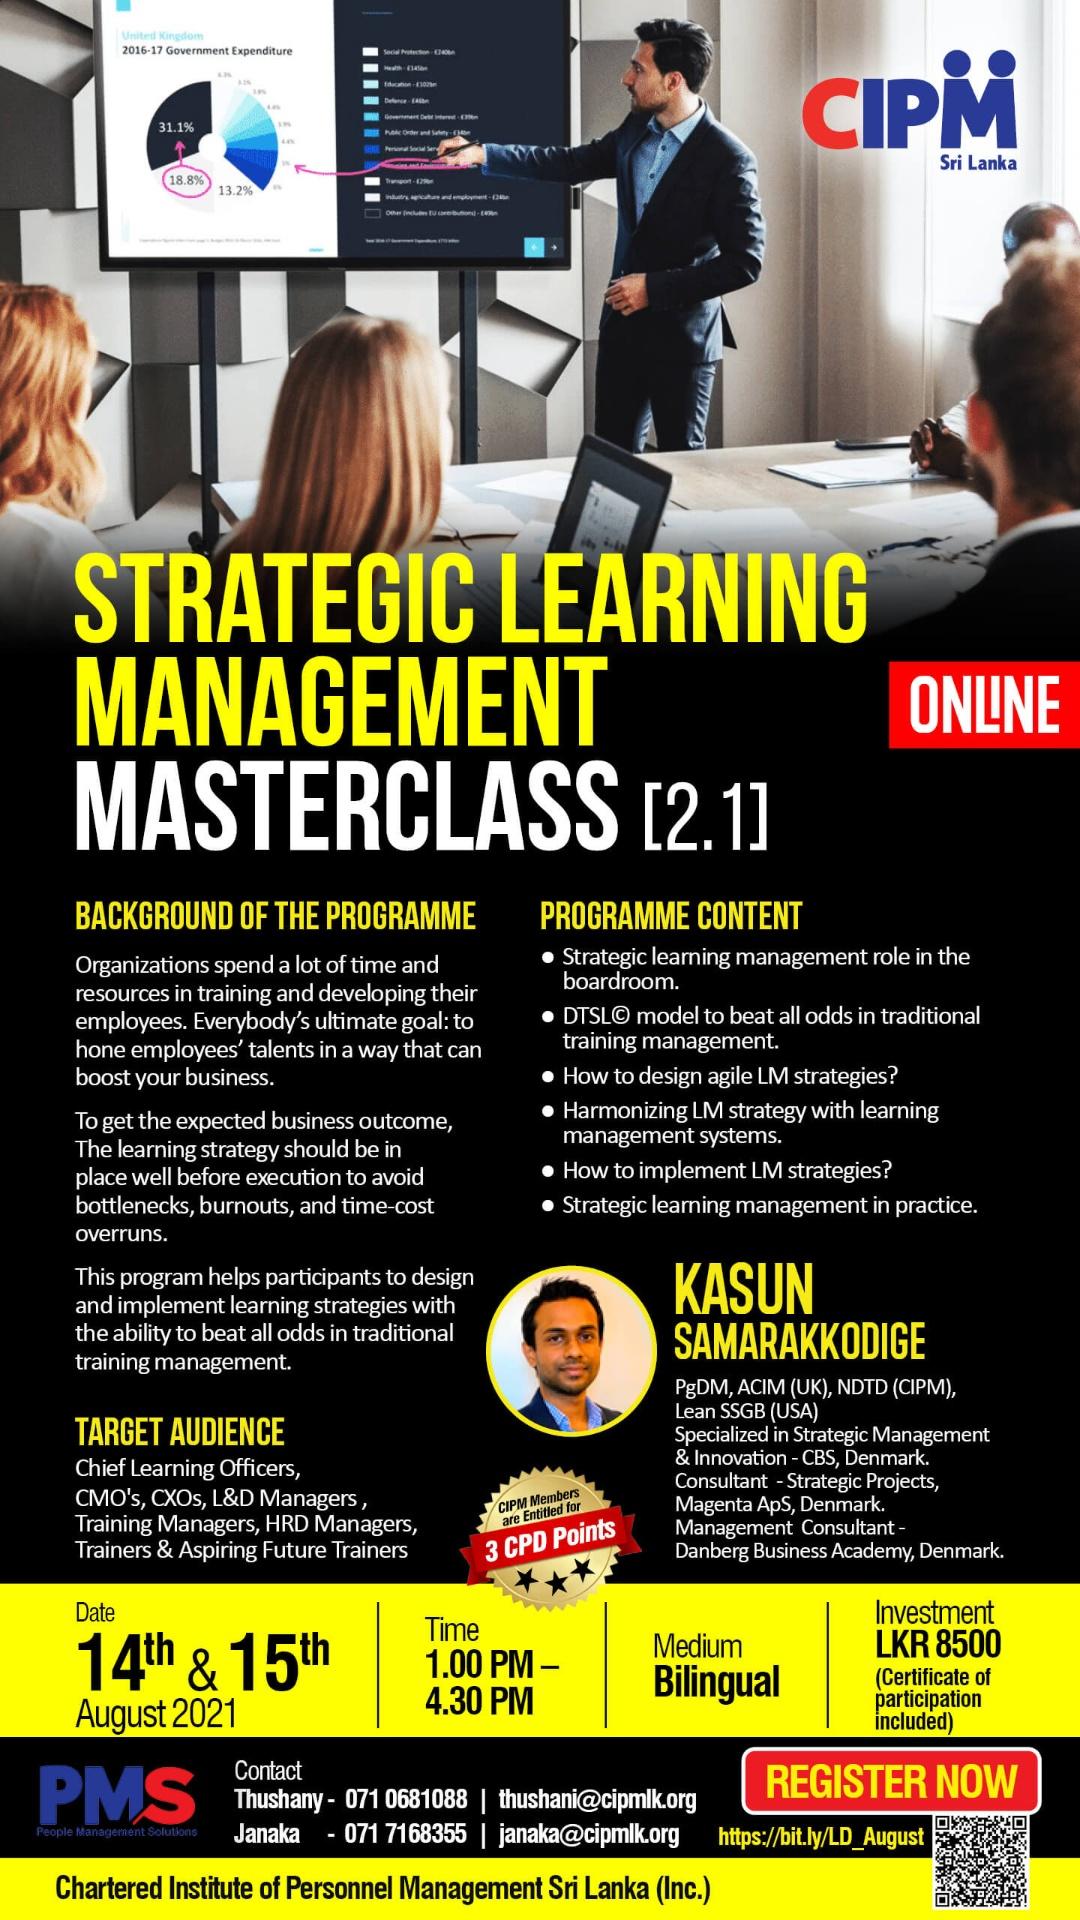 Strategic Learning Management Masterclass [2.1]